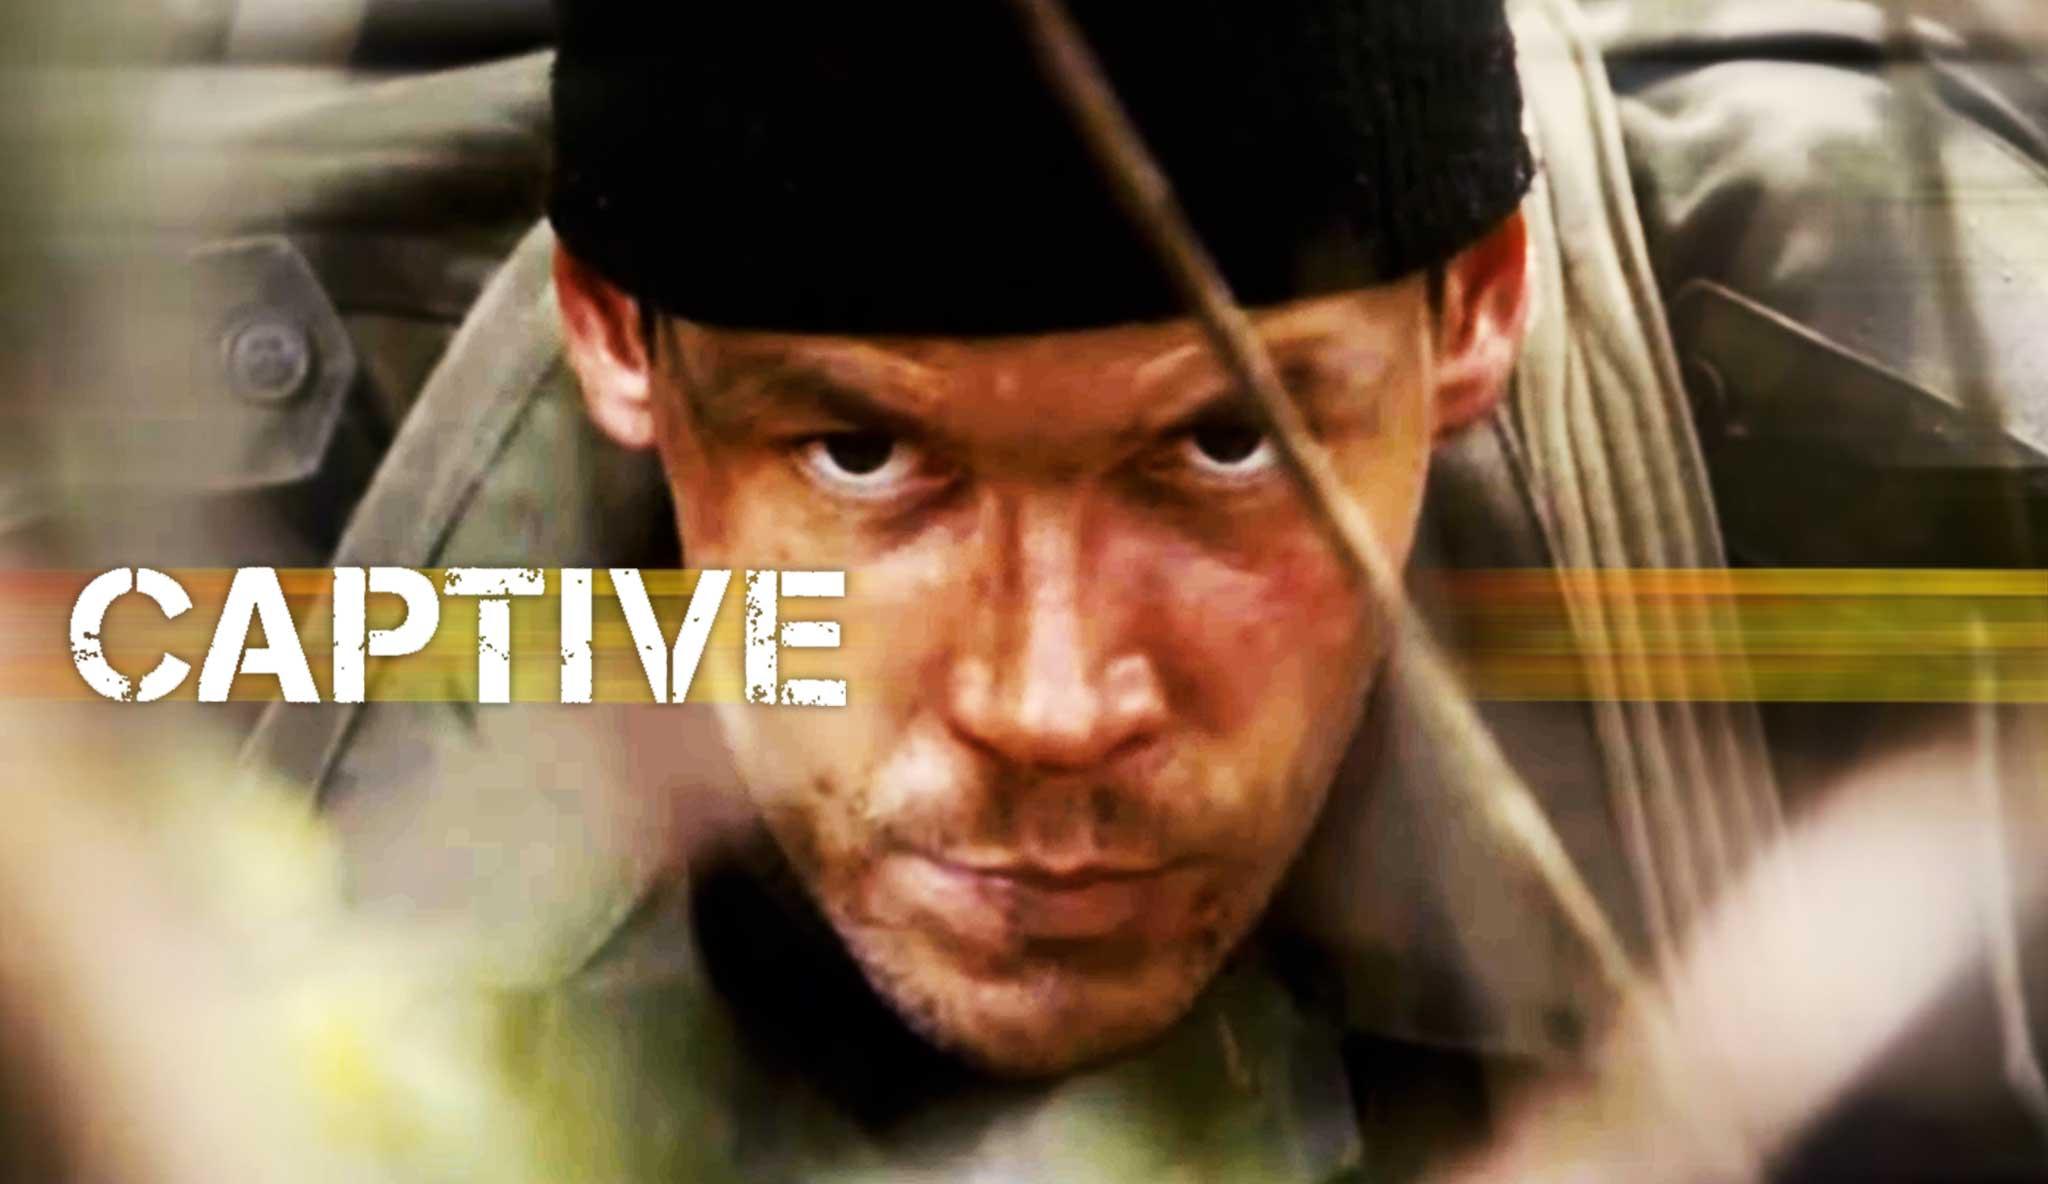 captive-gefangen-in-tschetschenien\header.jpg